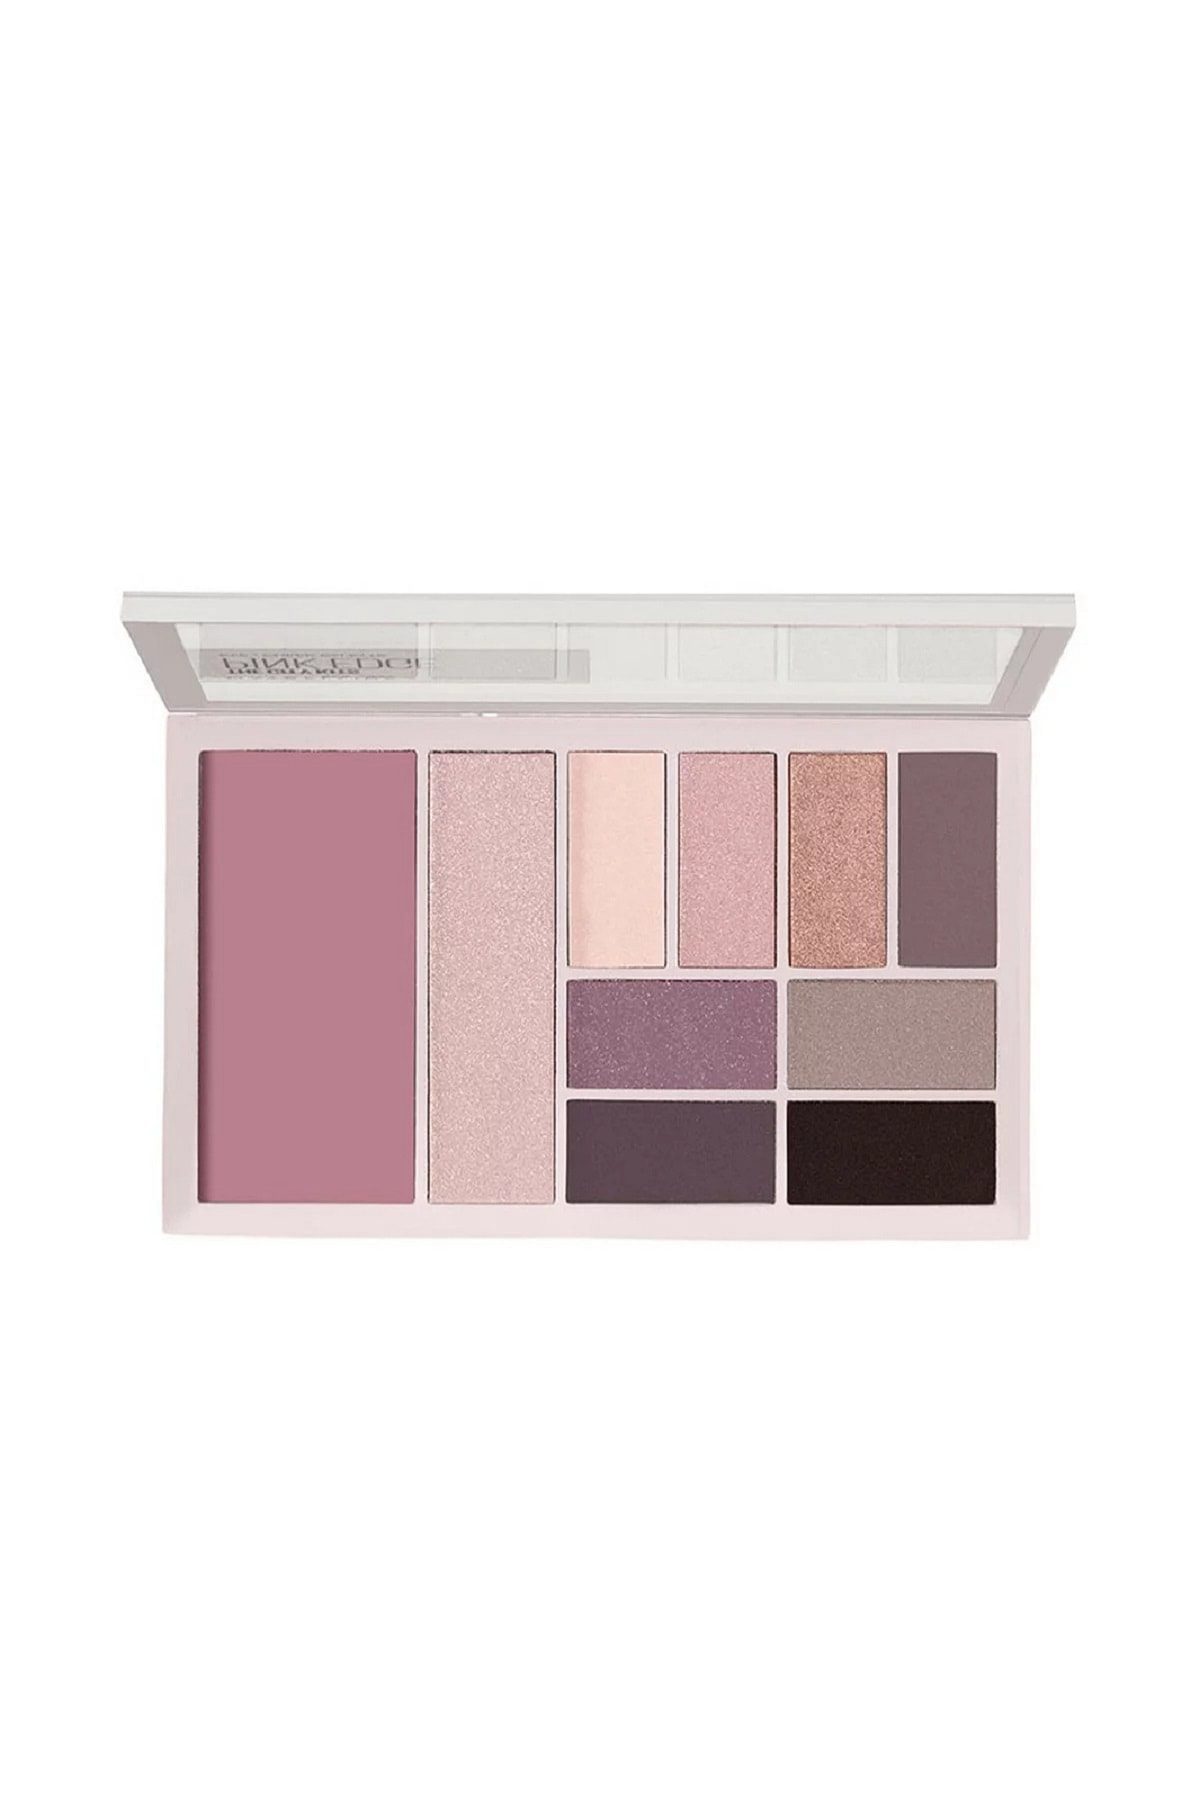 Maybelline New York Göz ve Ten Paleti - The City Kits Pallette Pink Edge 3600531434632 2